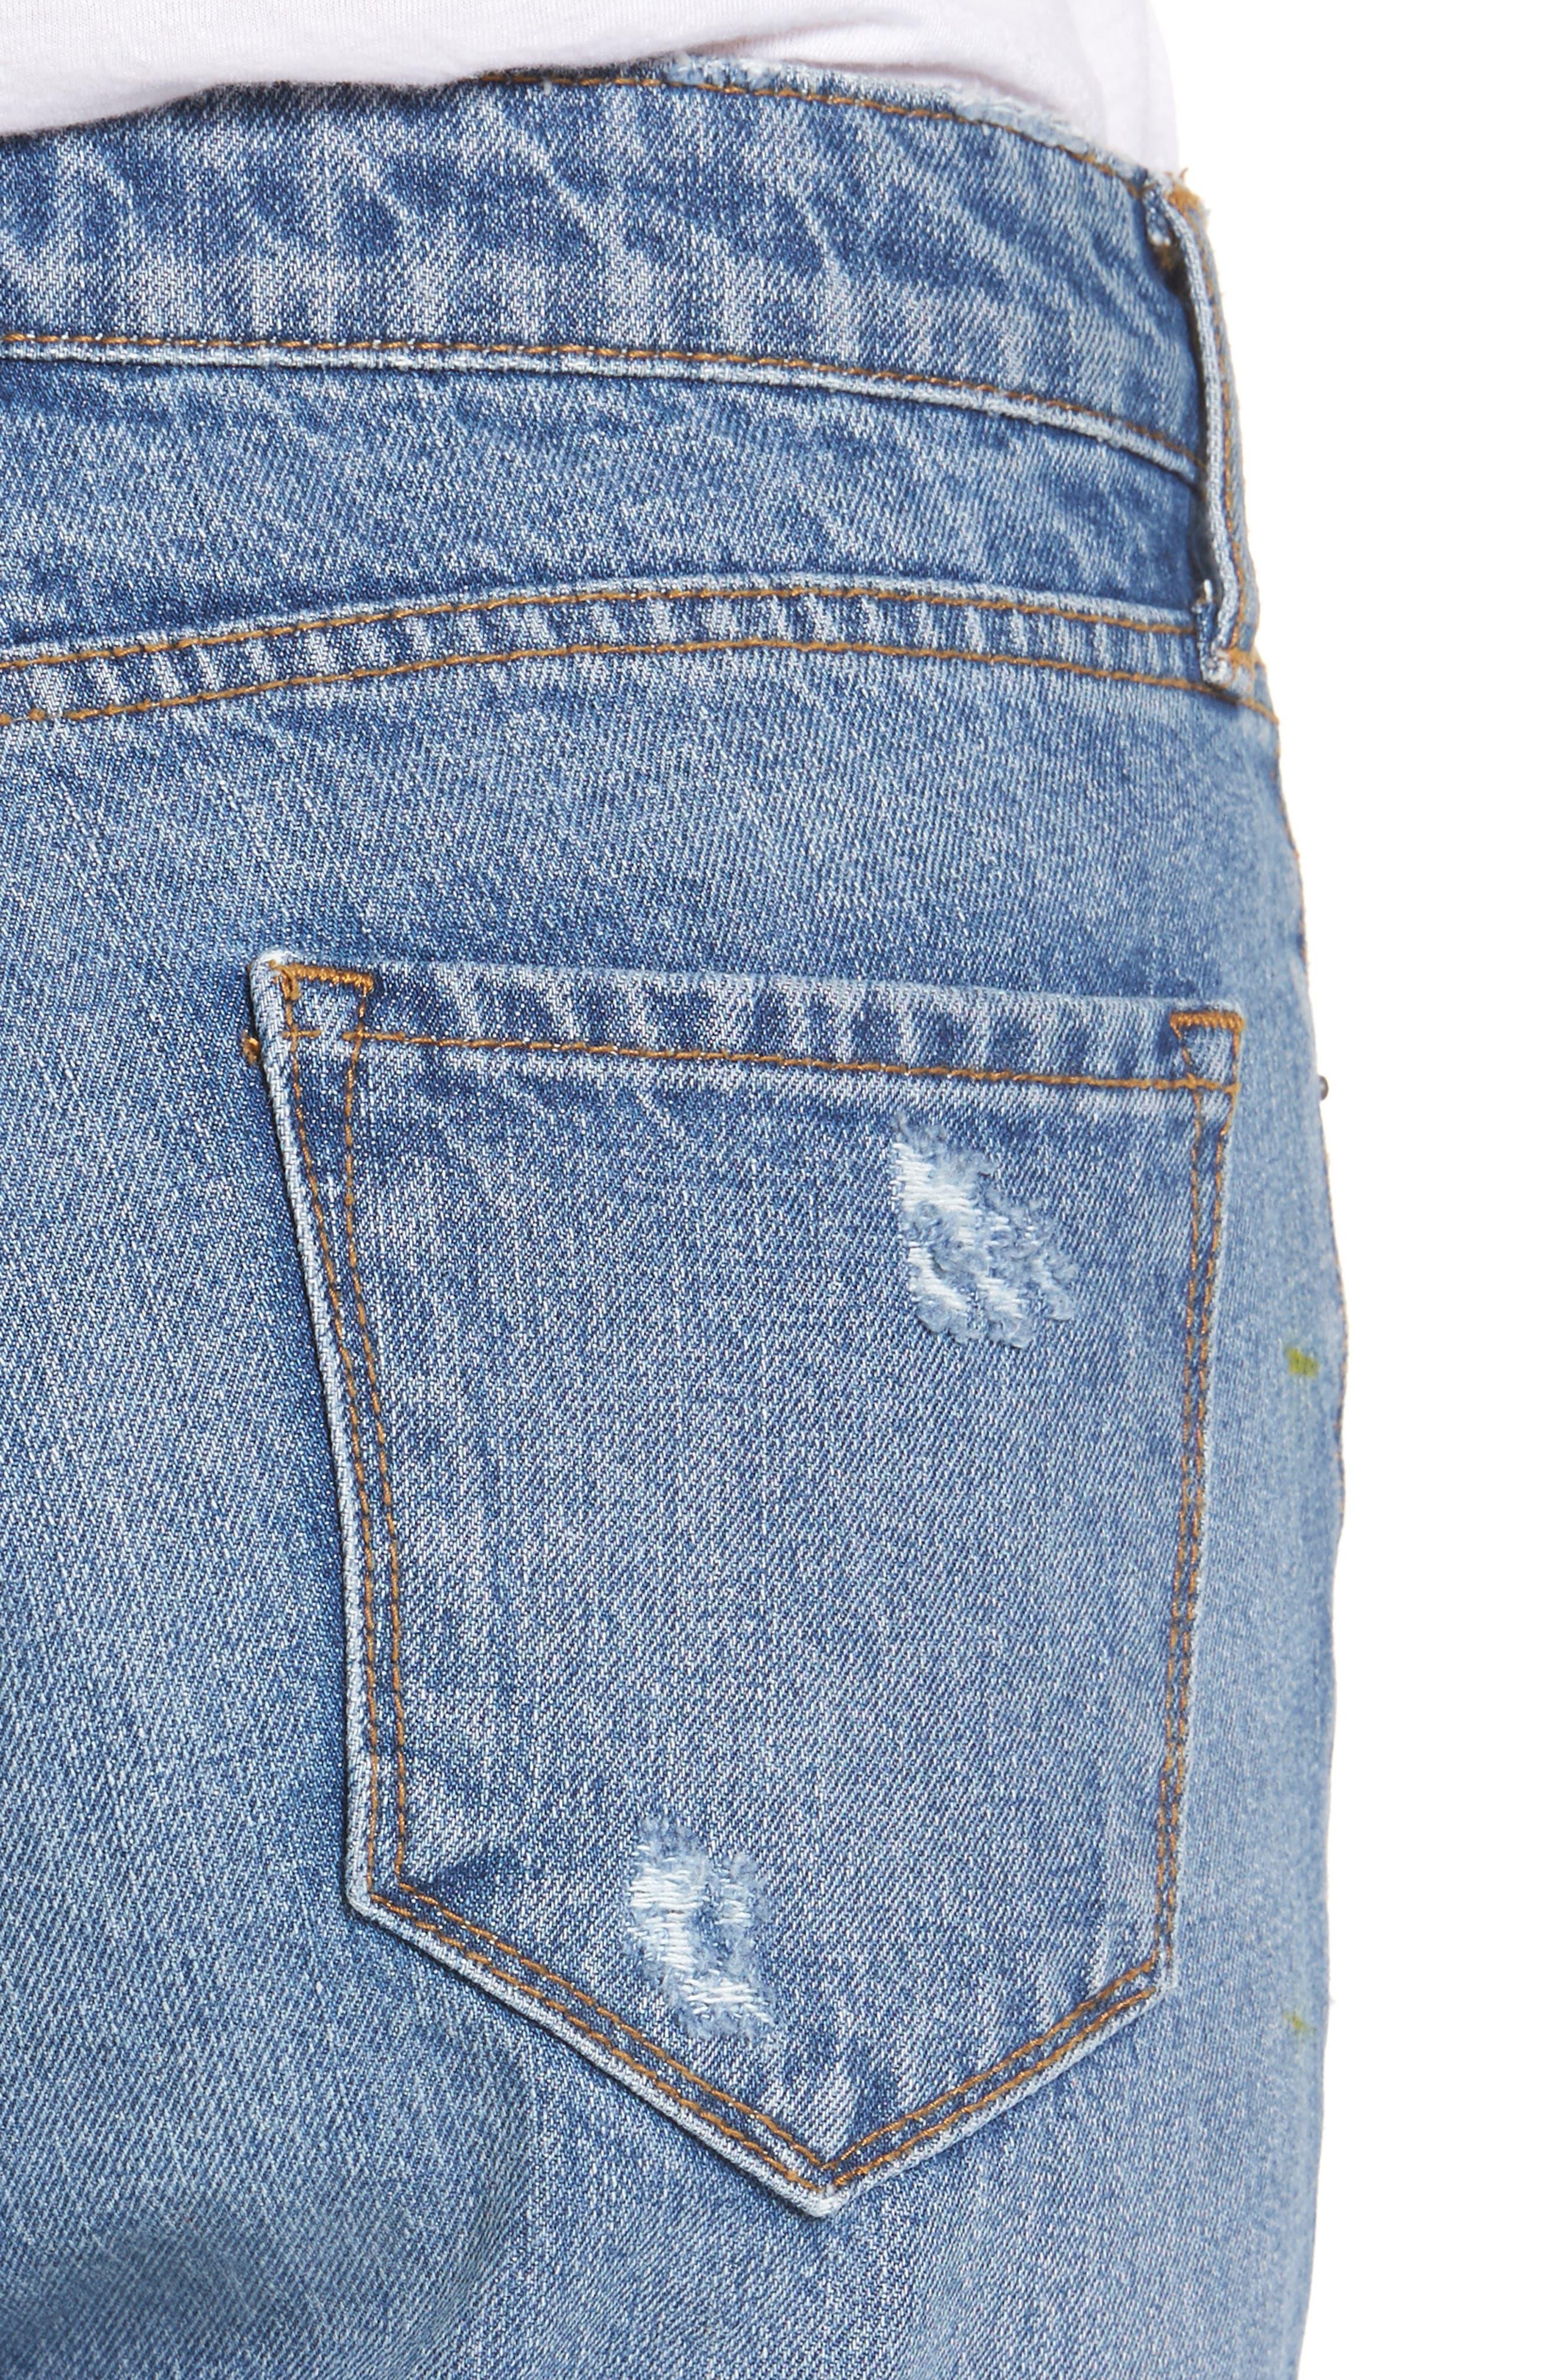 Taylor Ripped Crop Boyfriend Jeans,                             Alternate thumbnail 4, color,                             400